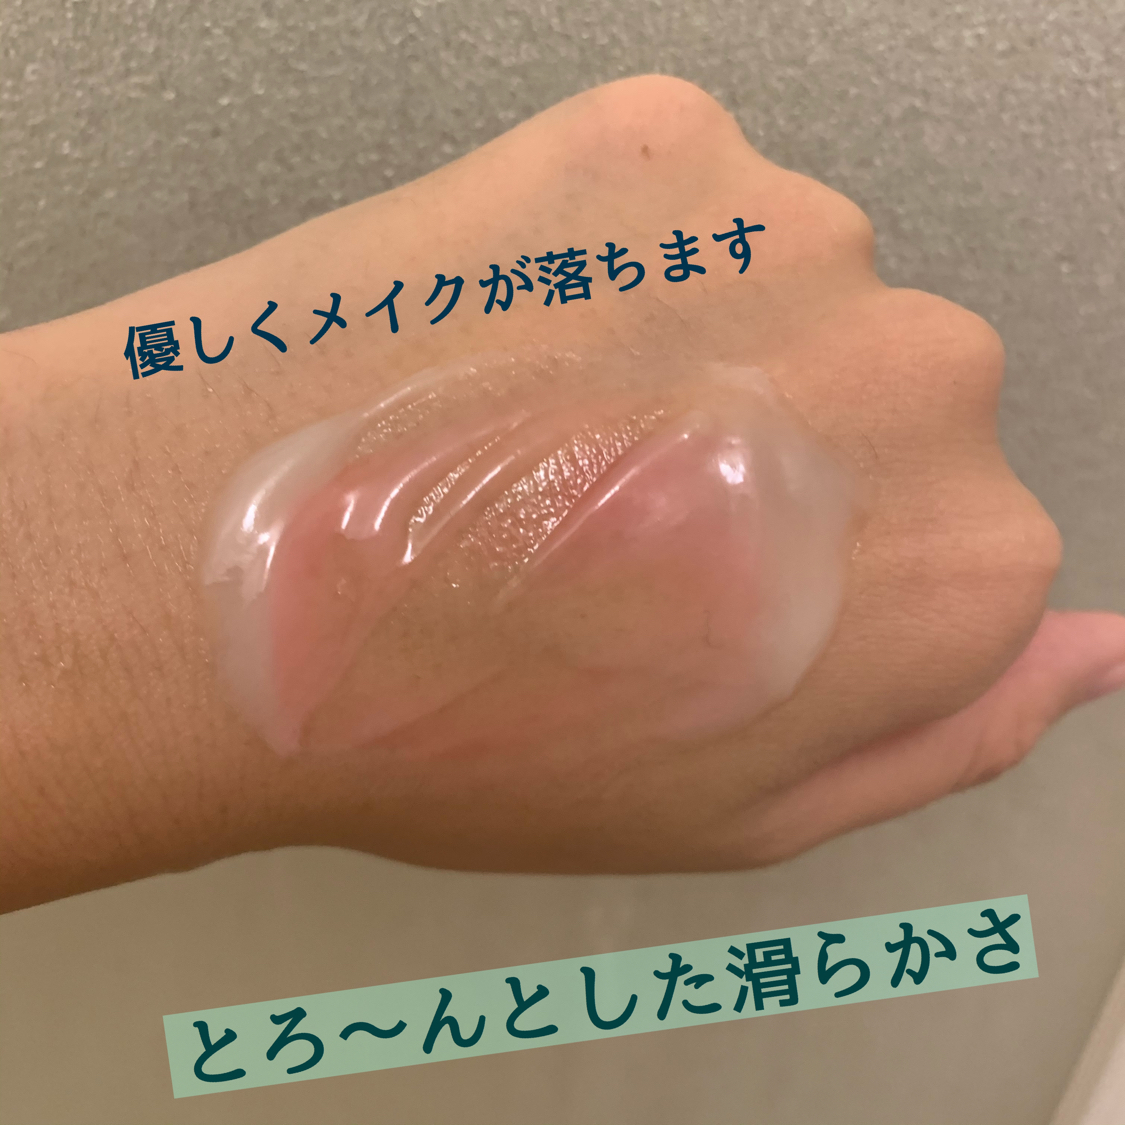 SHIRO タマヌクレンジングバーム(クレンジングバーム)を使ったクチコミ(2枚目)